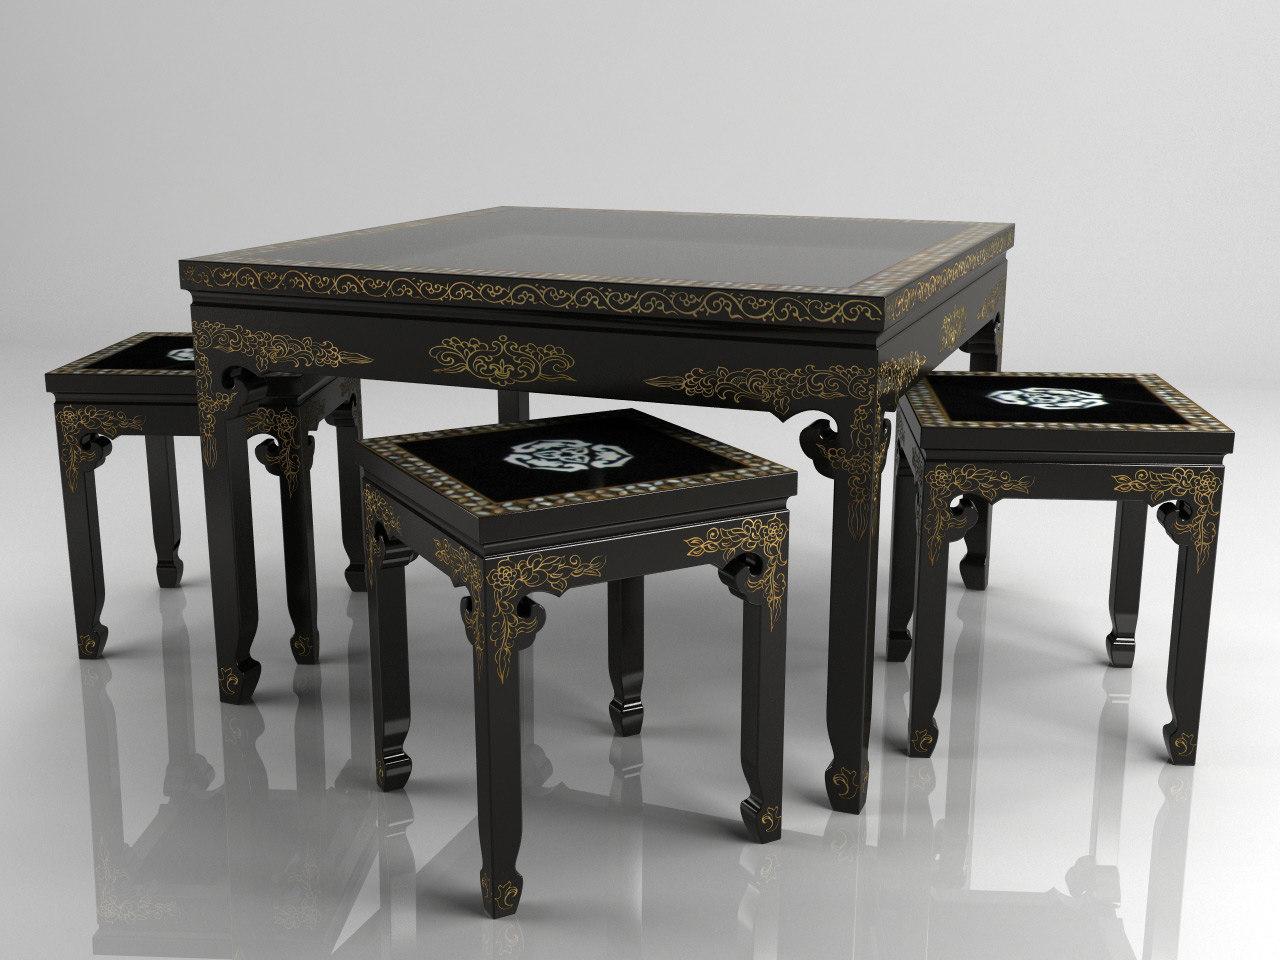 Antiquarian_little_table&chairs.jpg